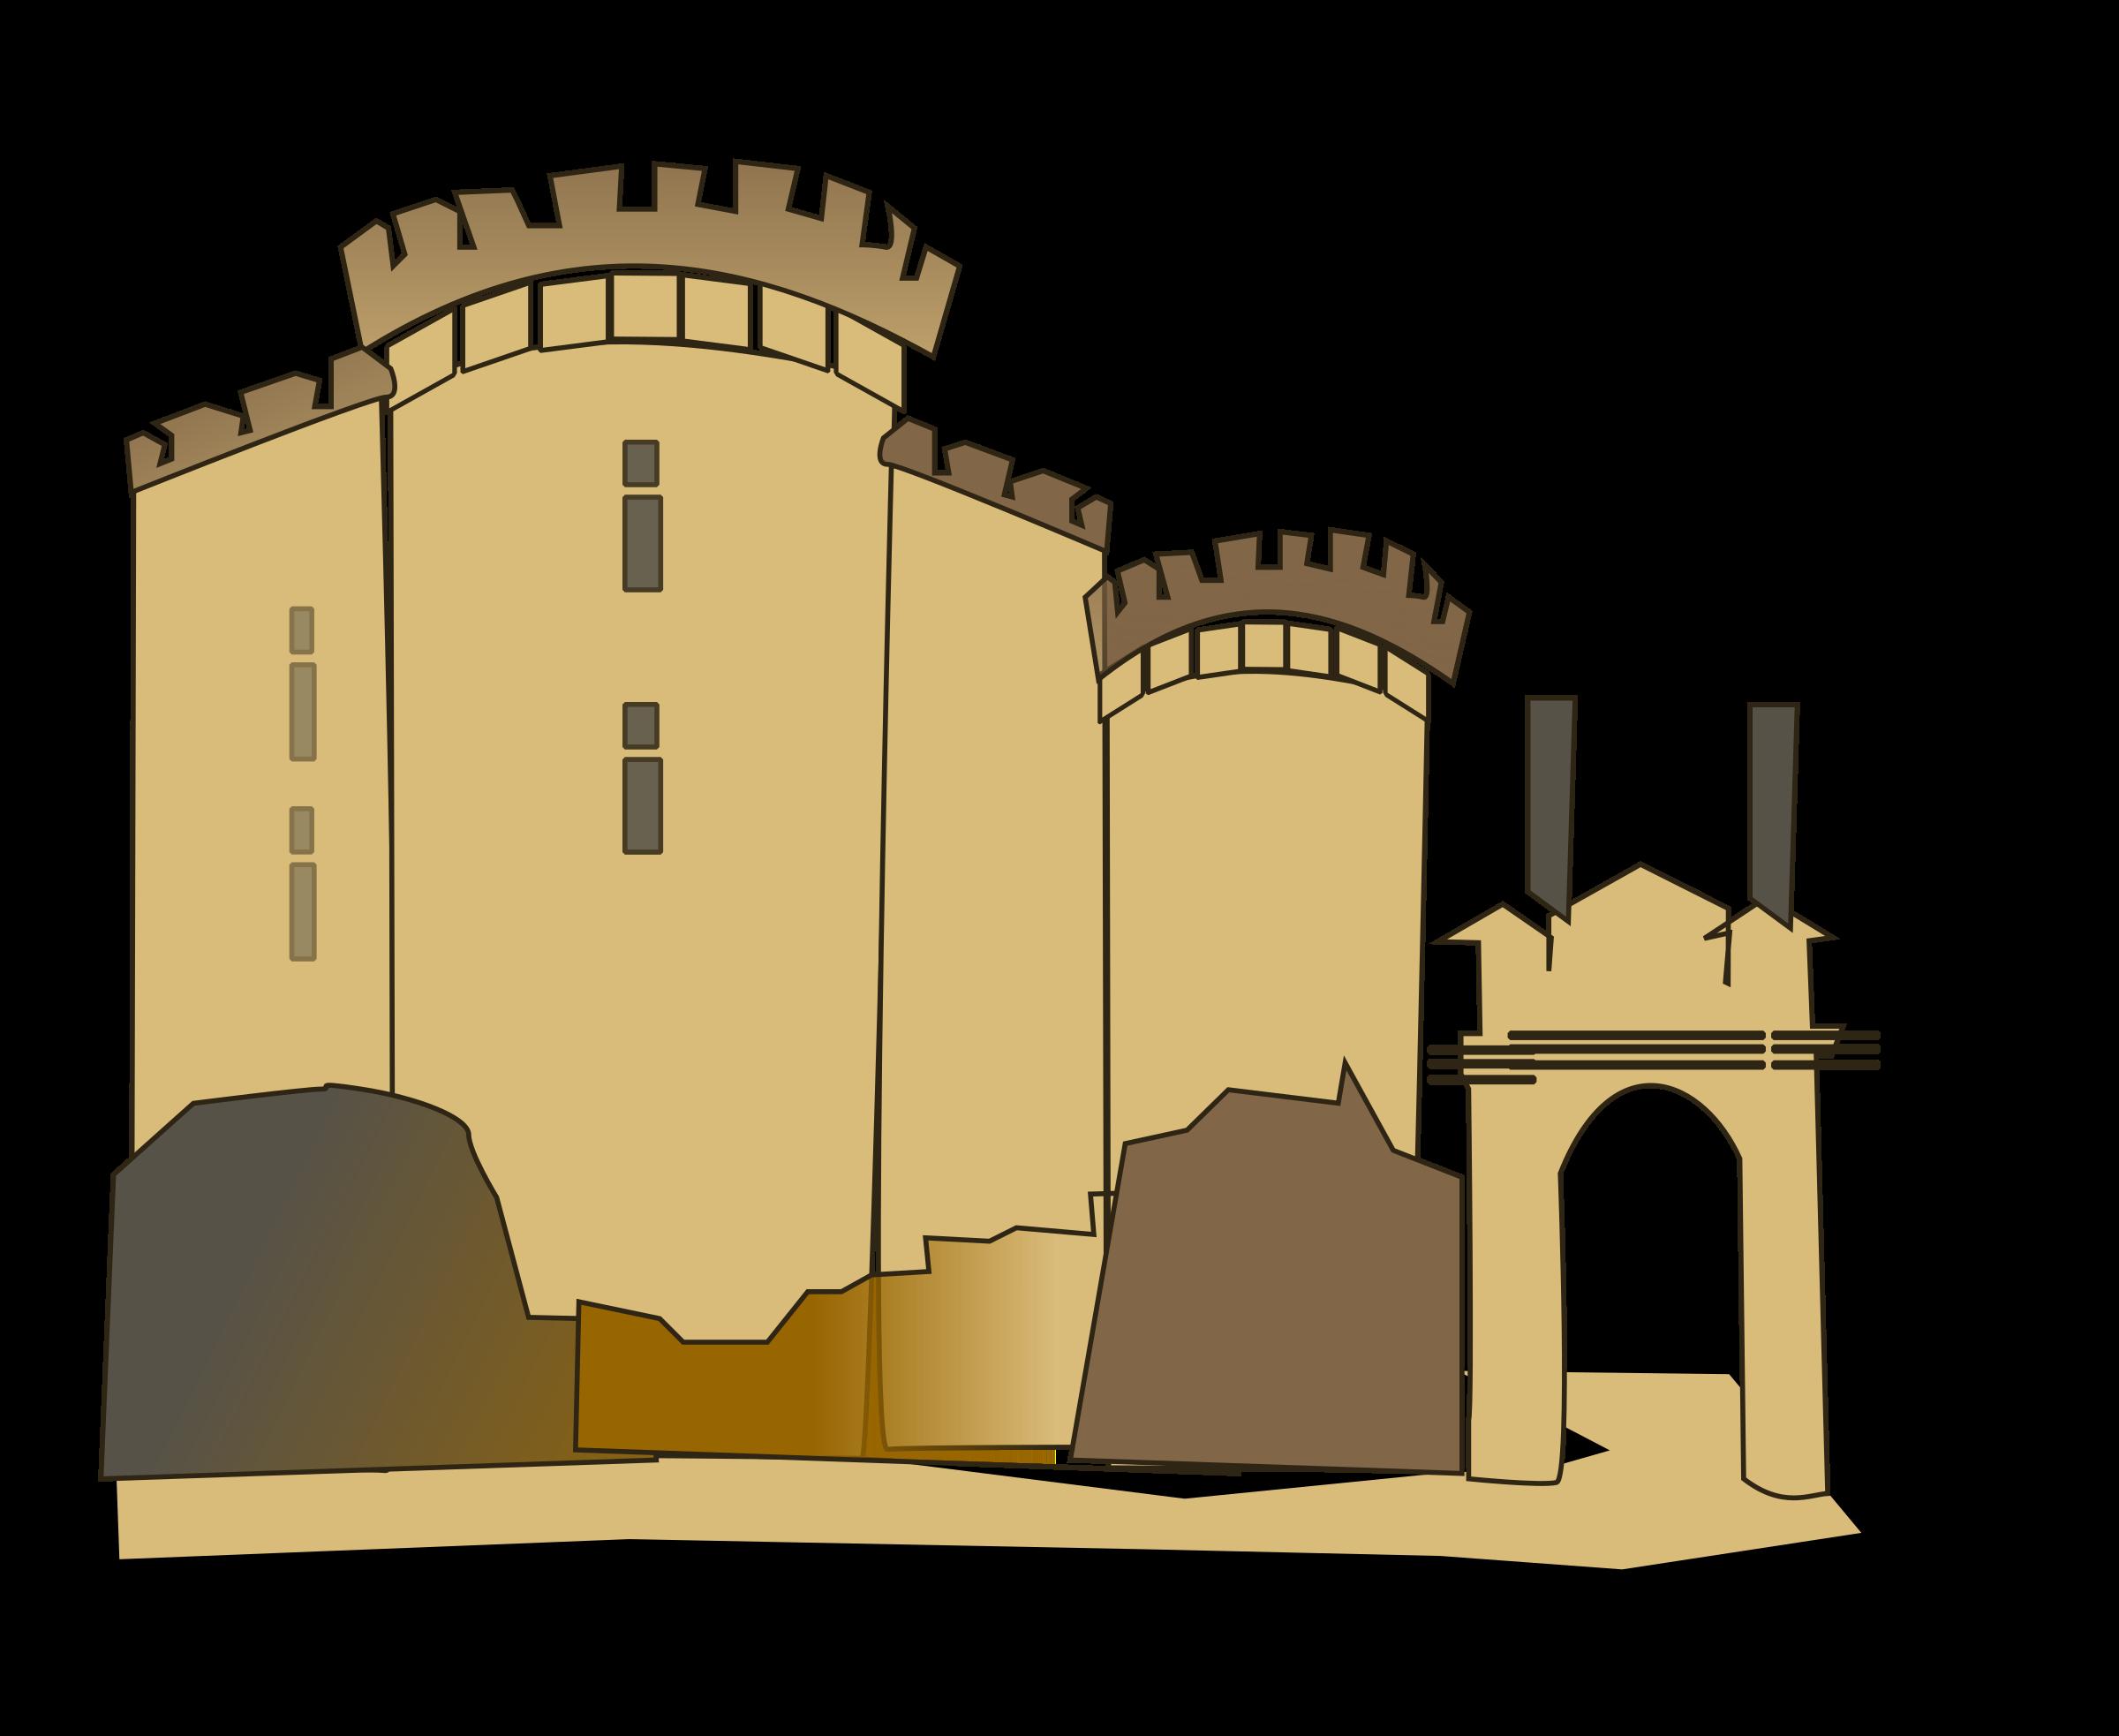 jpg royalty free library Building clipart medieval building. Bastille big image png